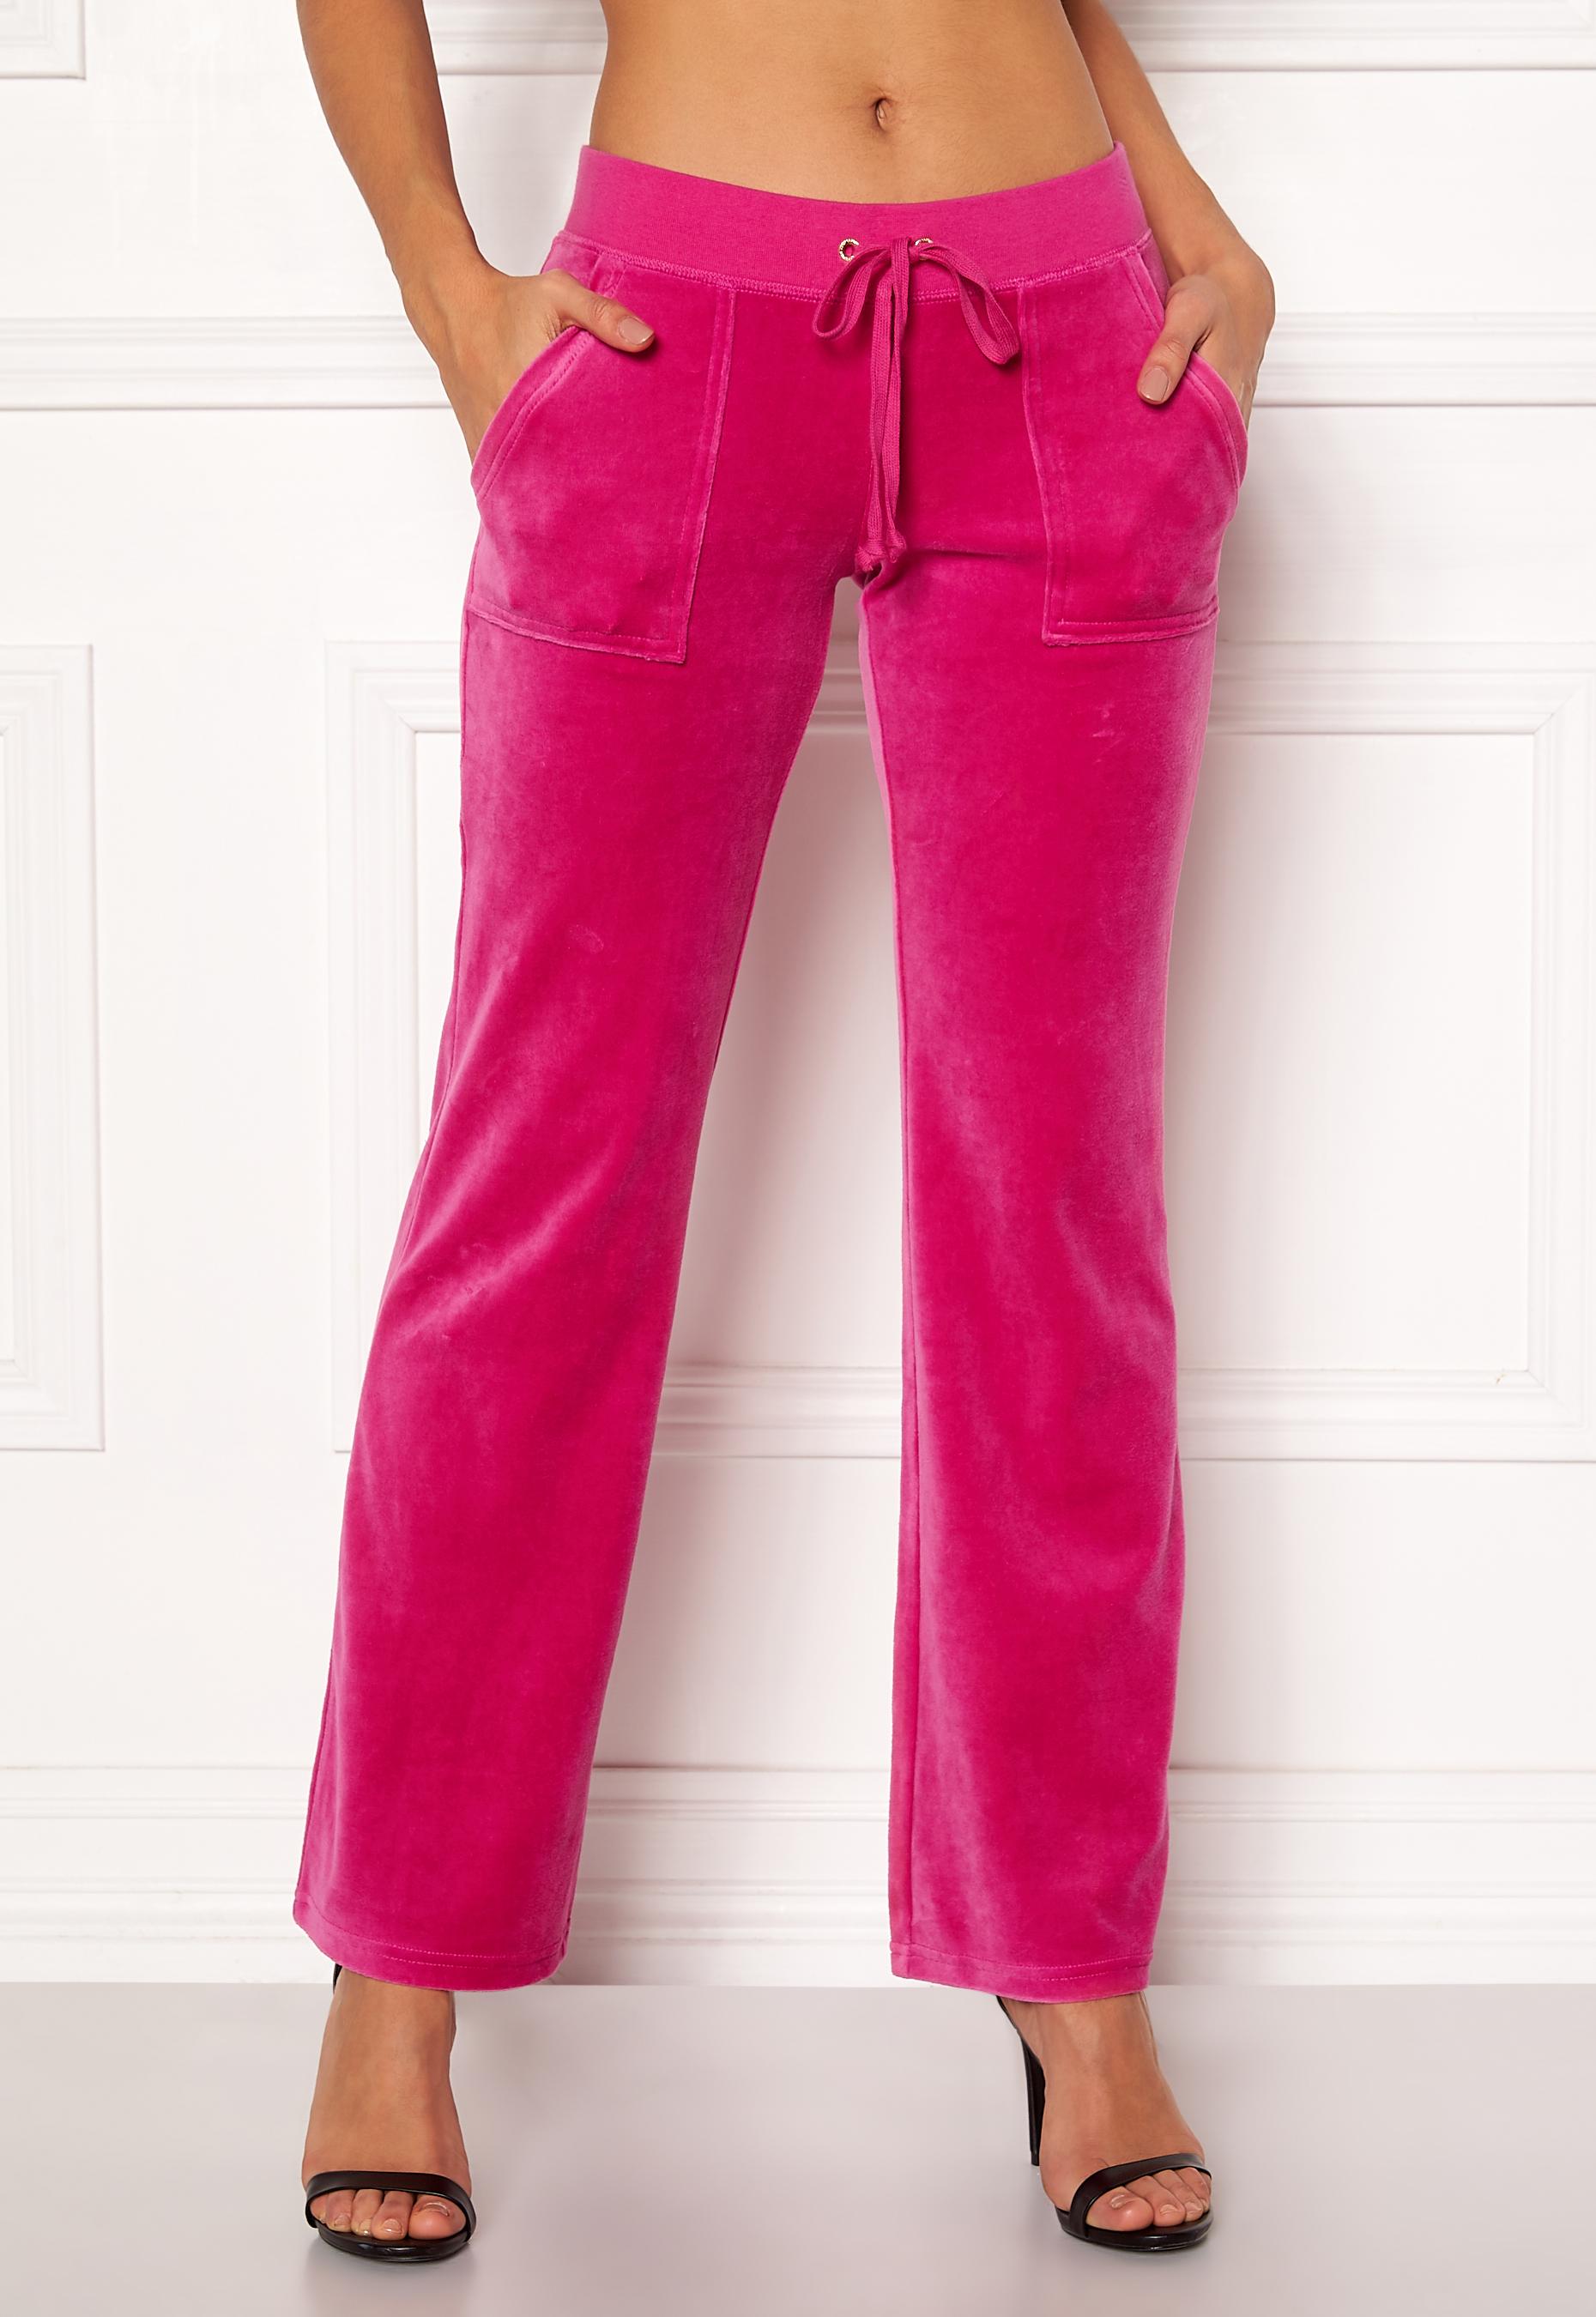 561f1b16149e Juicy Couture Velour Del Rey Pant Raspberry Pink - Bubbleroom